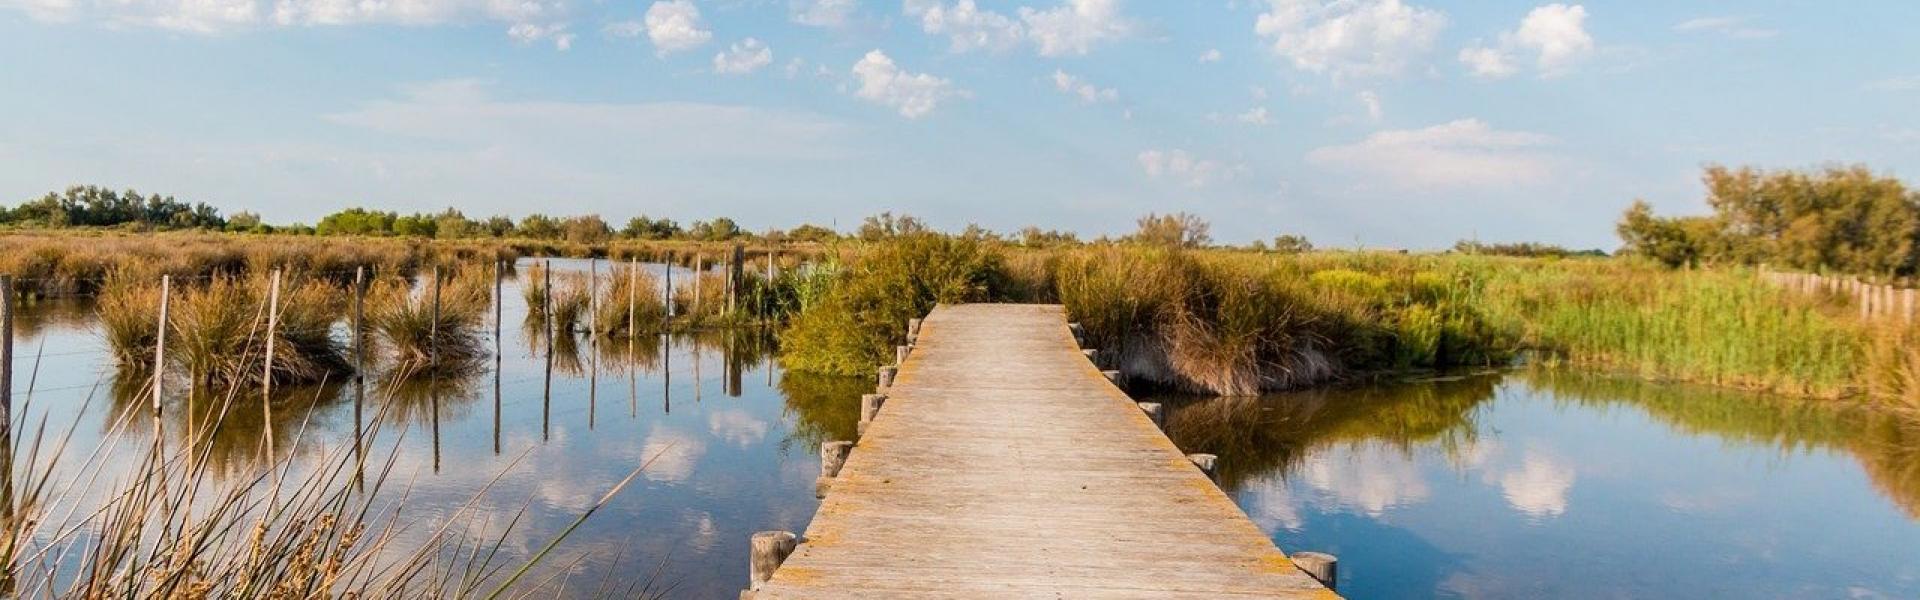 Ponton sur les étangs en Camargue panorama